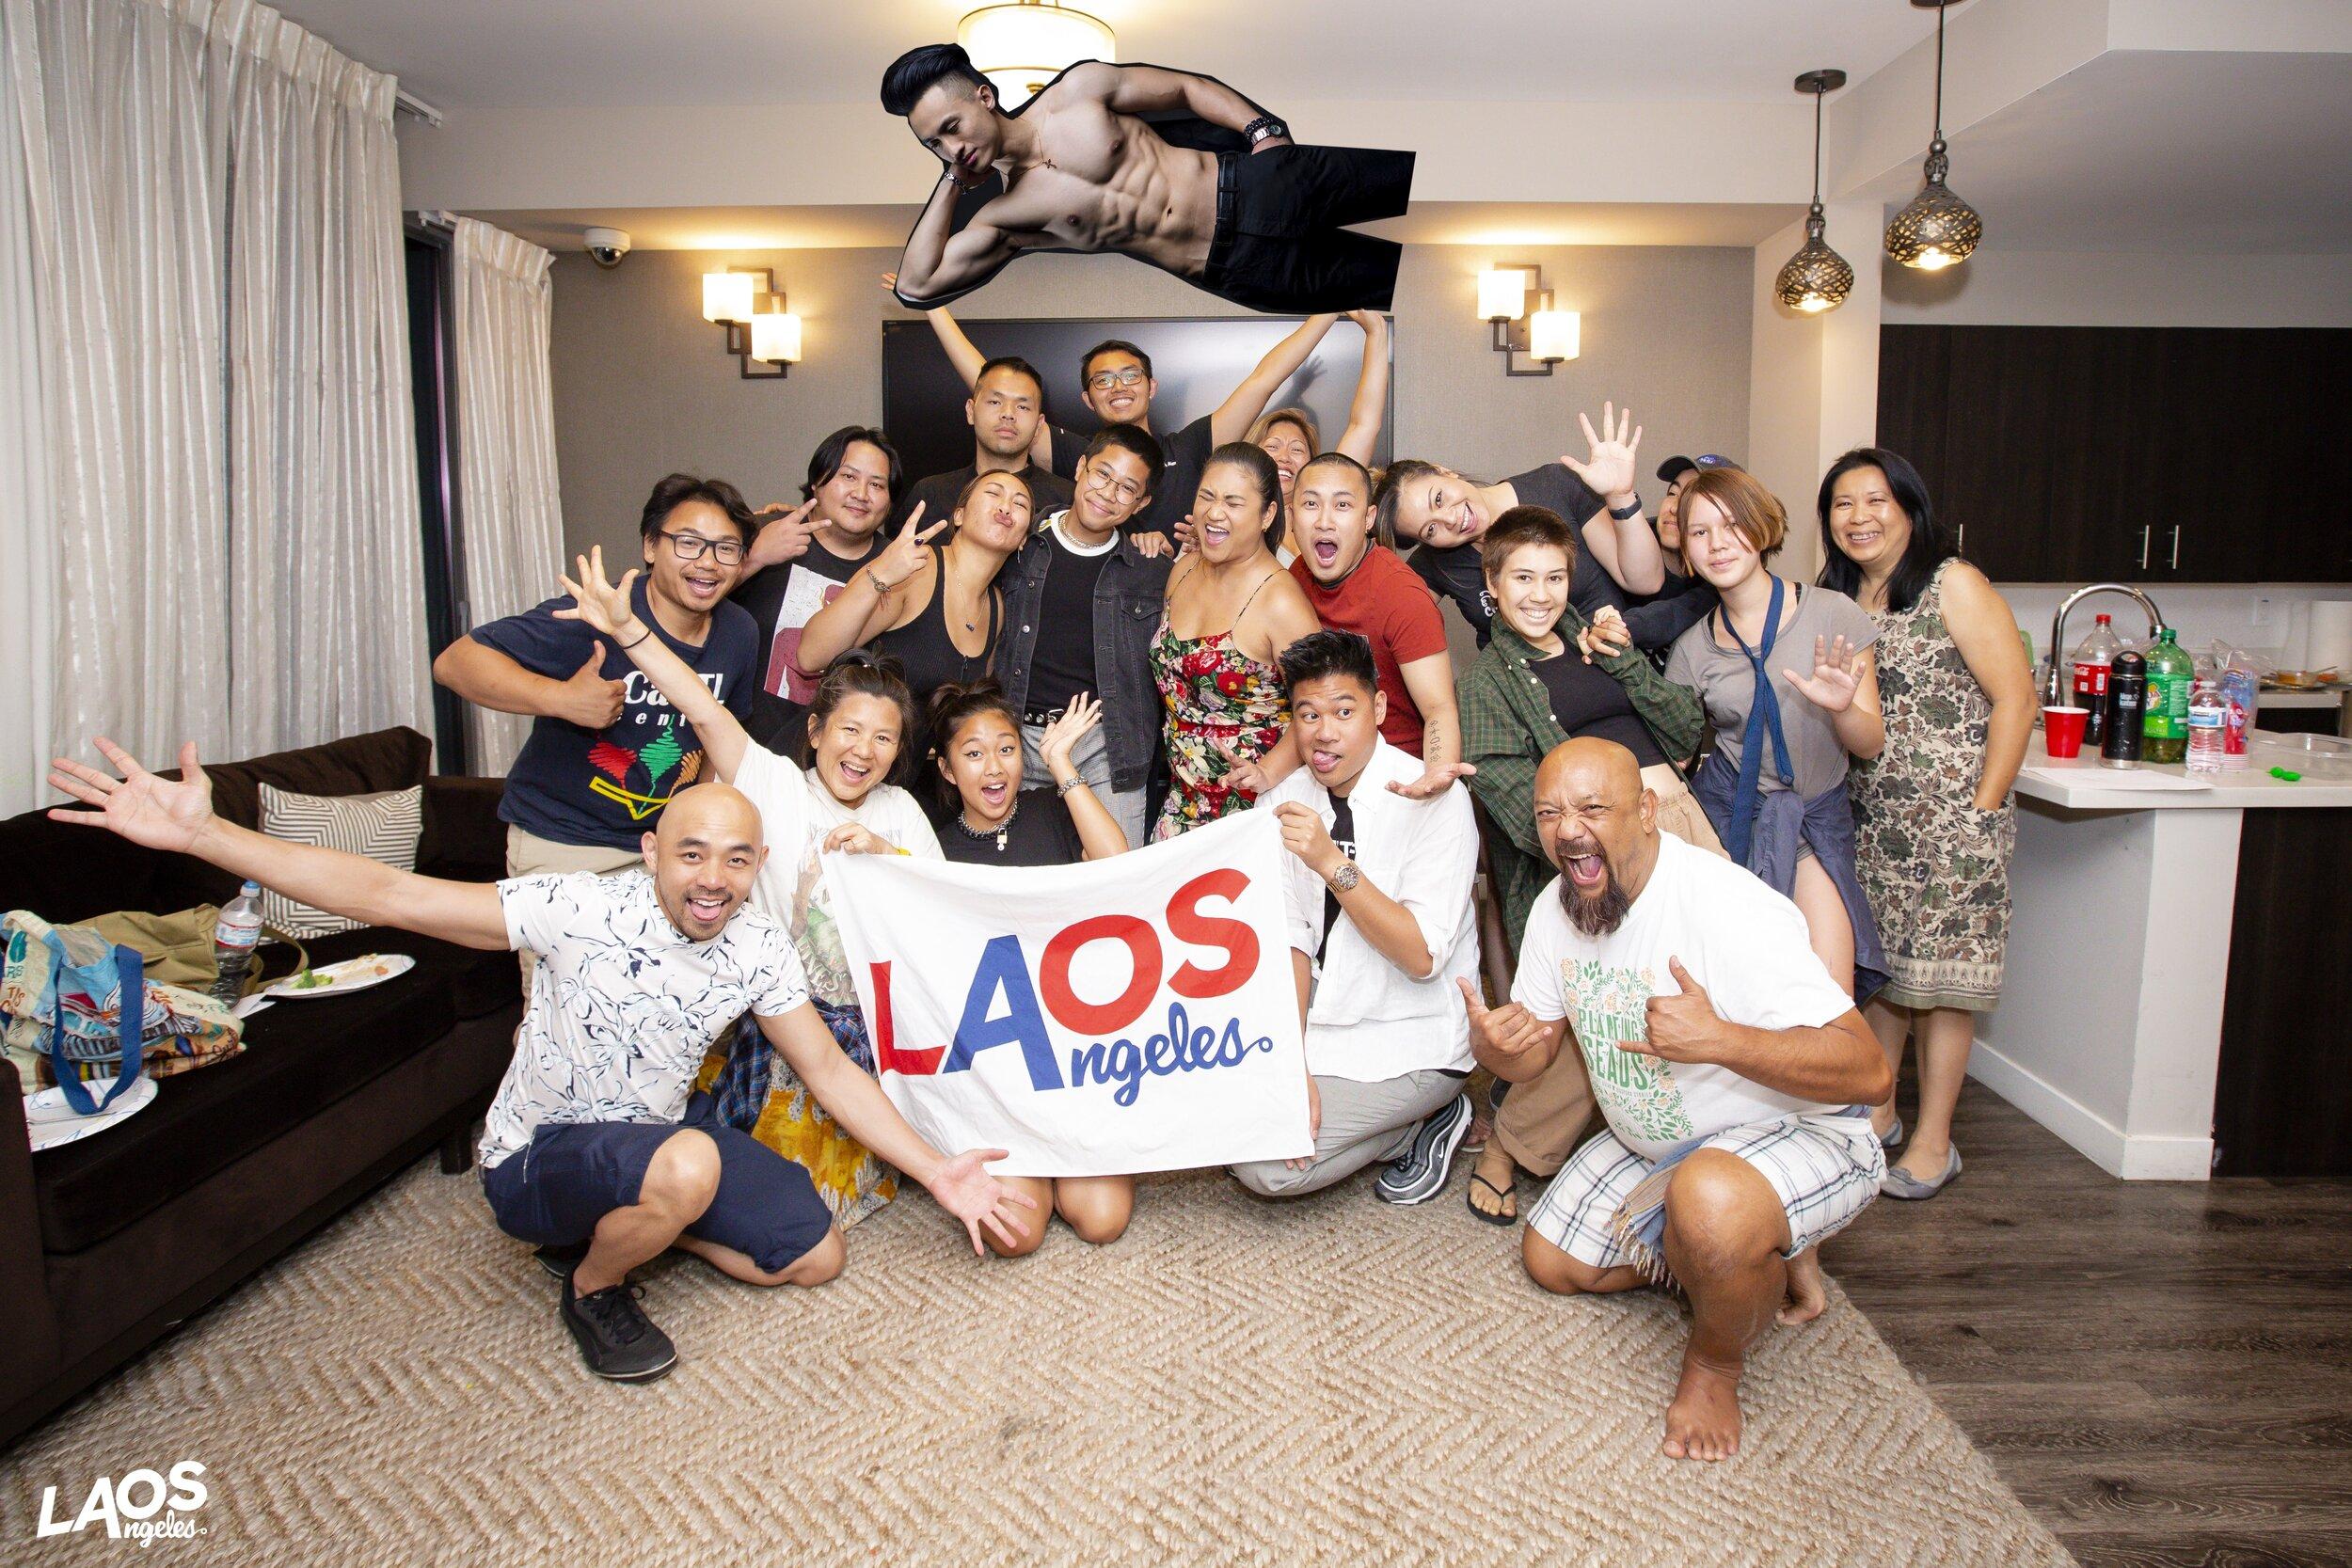 LADS 14 - July 2019